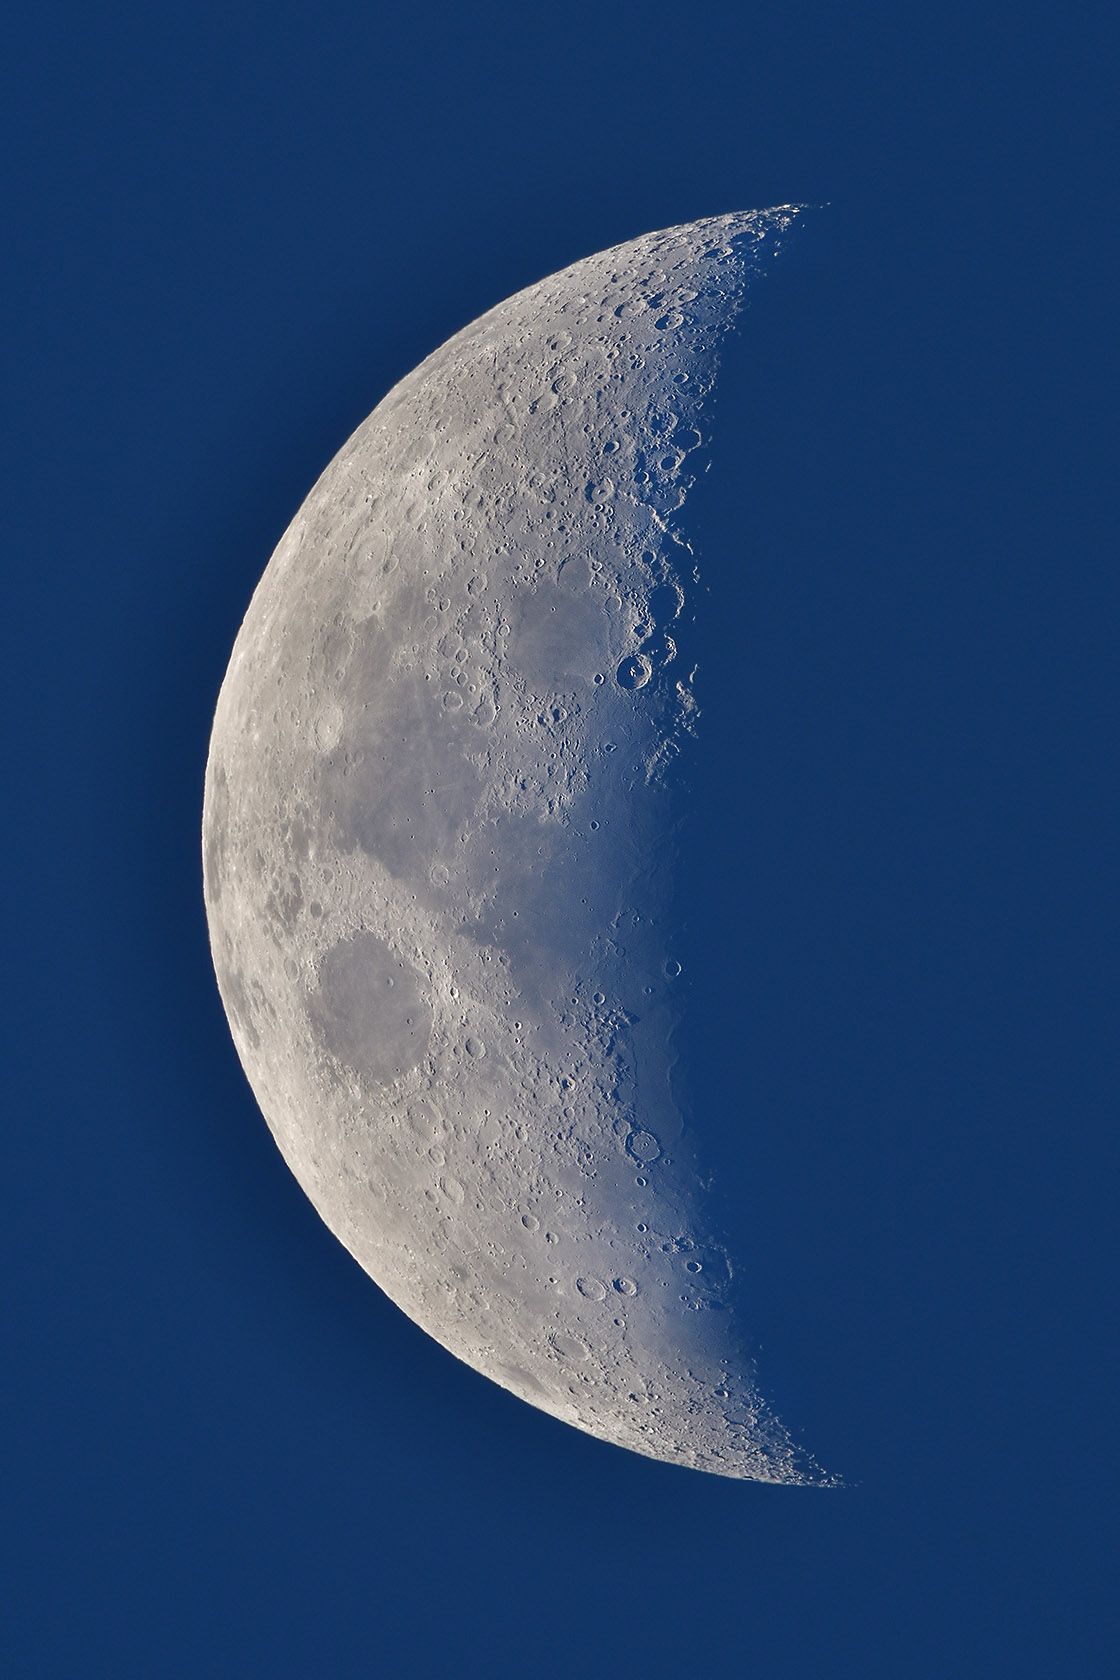 moon_160512_blanca115edt2_6501_1120_2_20180528231333f16.jpg